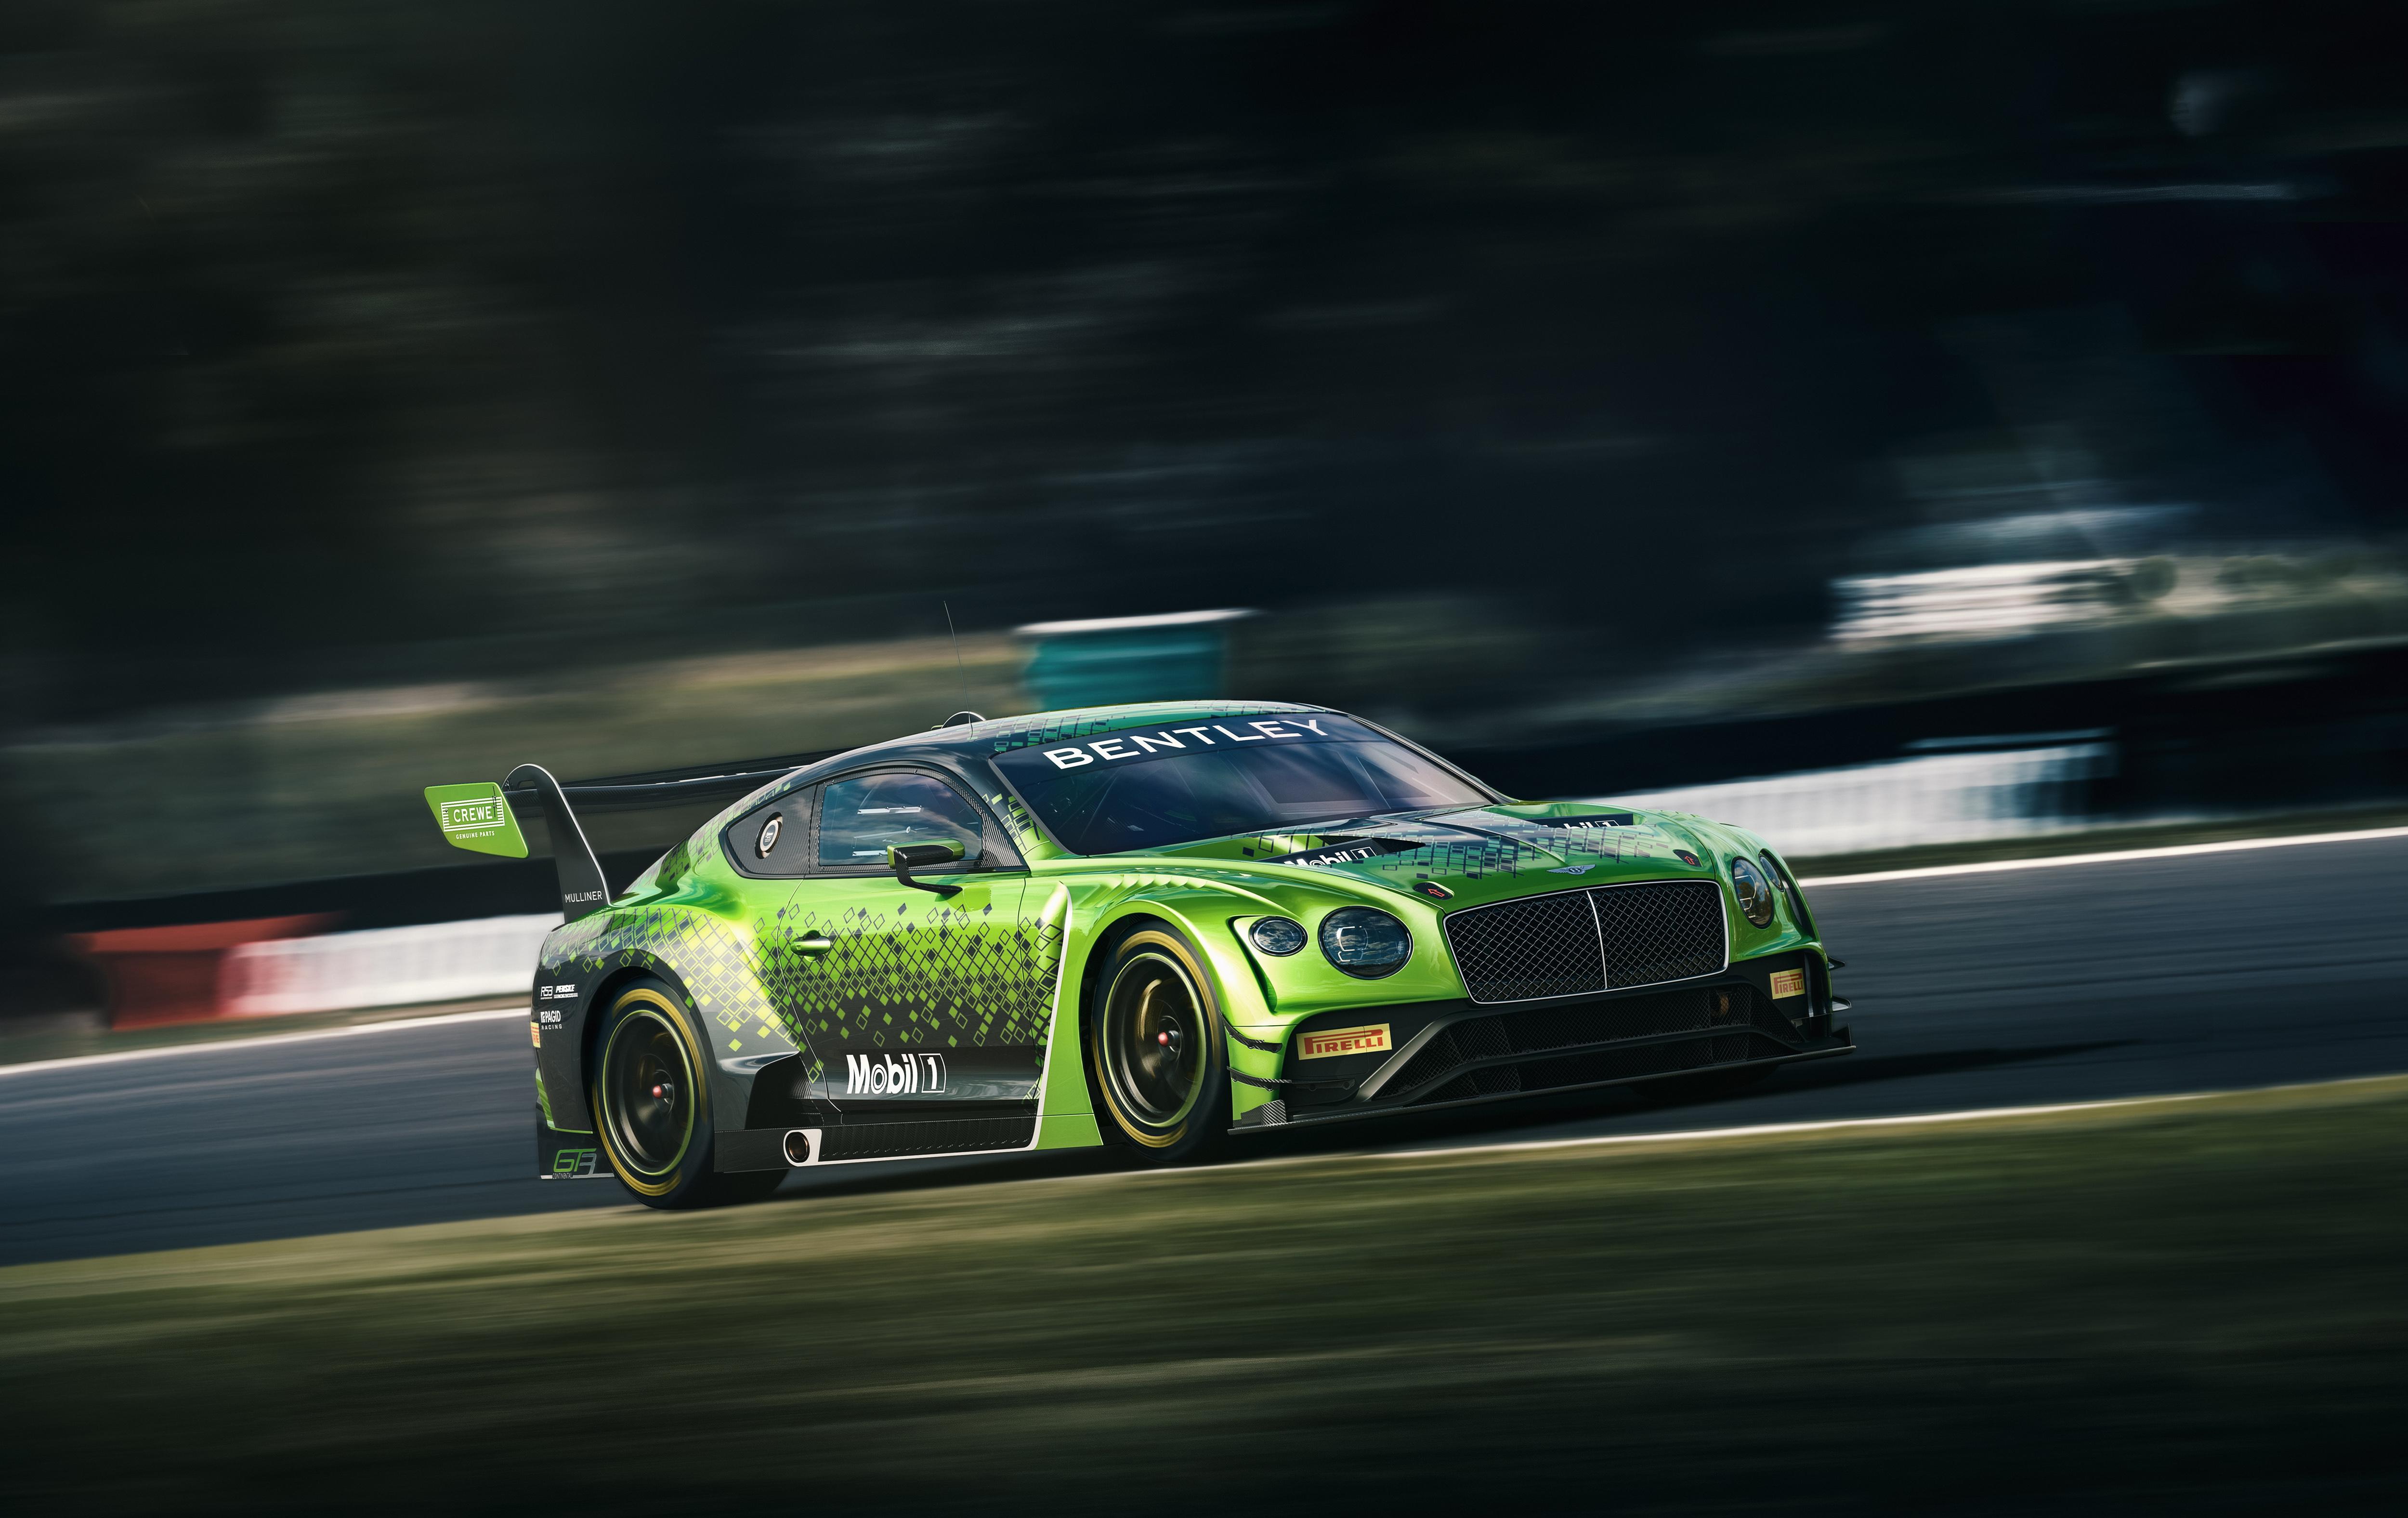 Midweek Motorsport series 15 episode 2